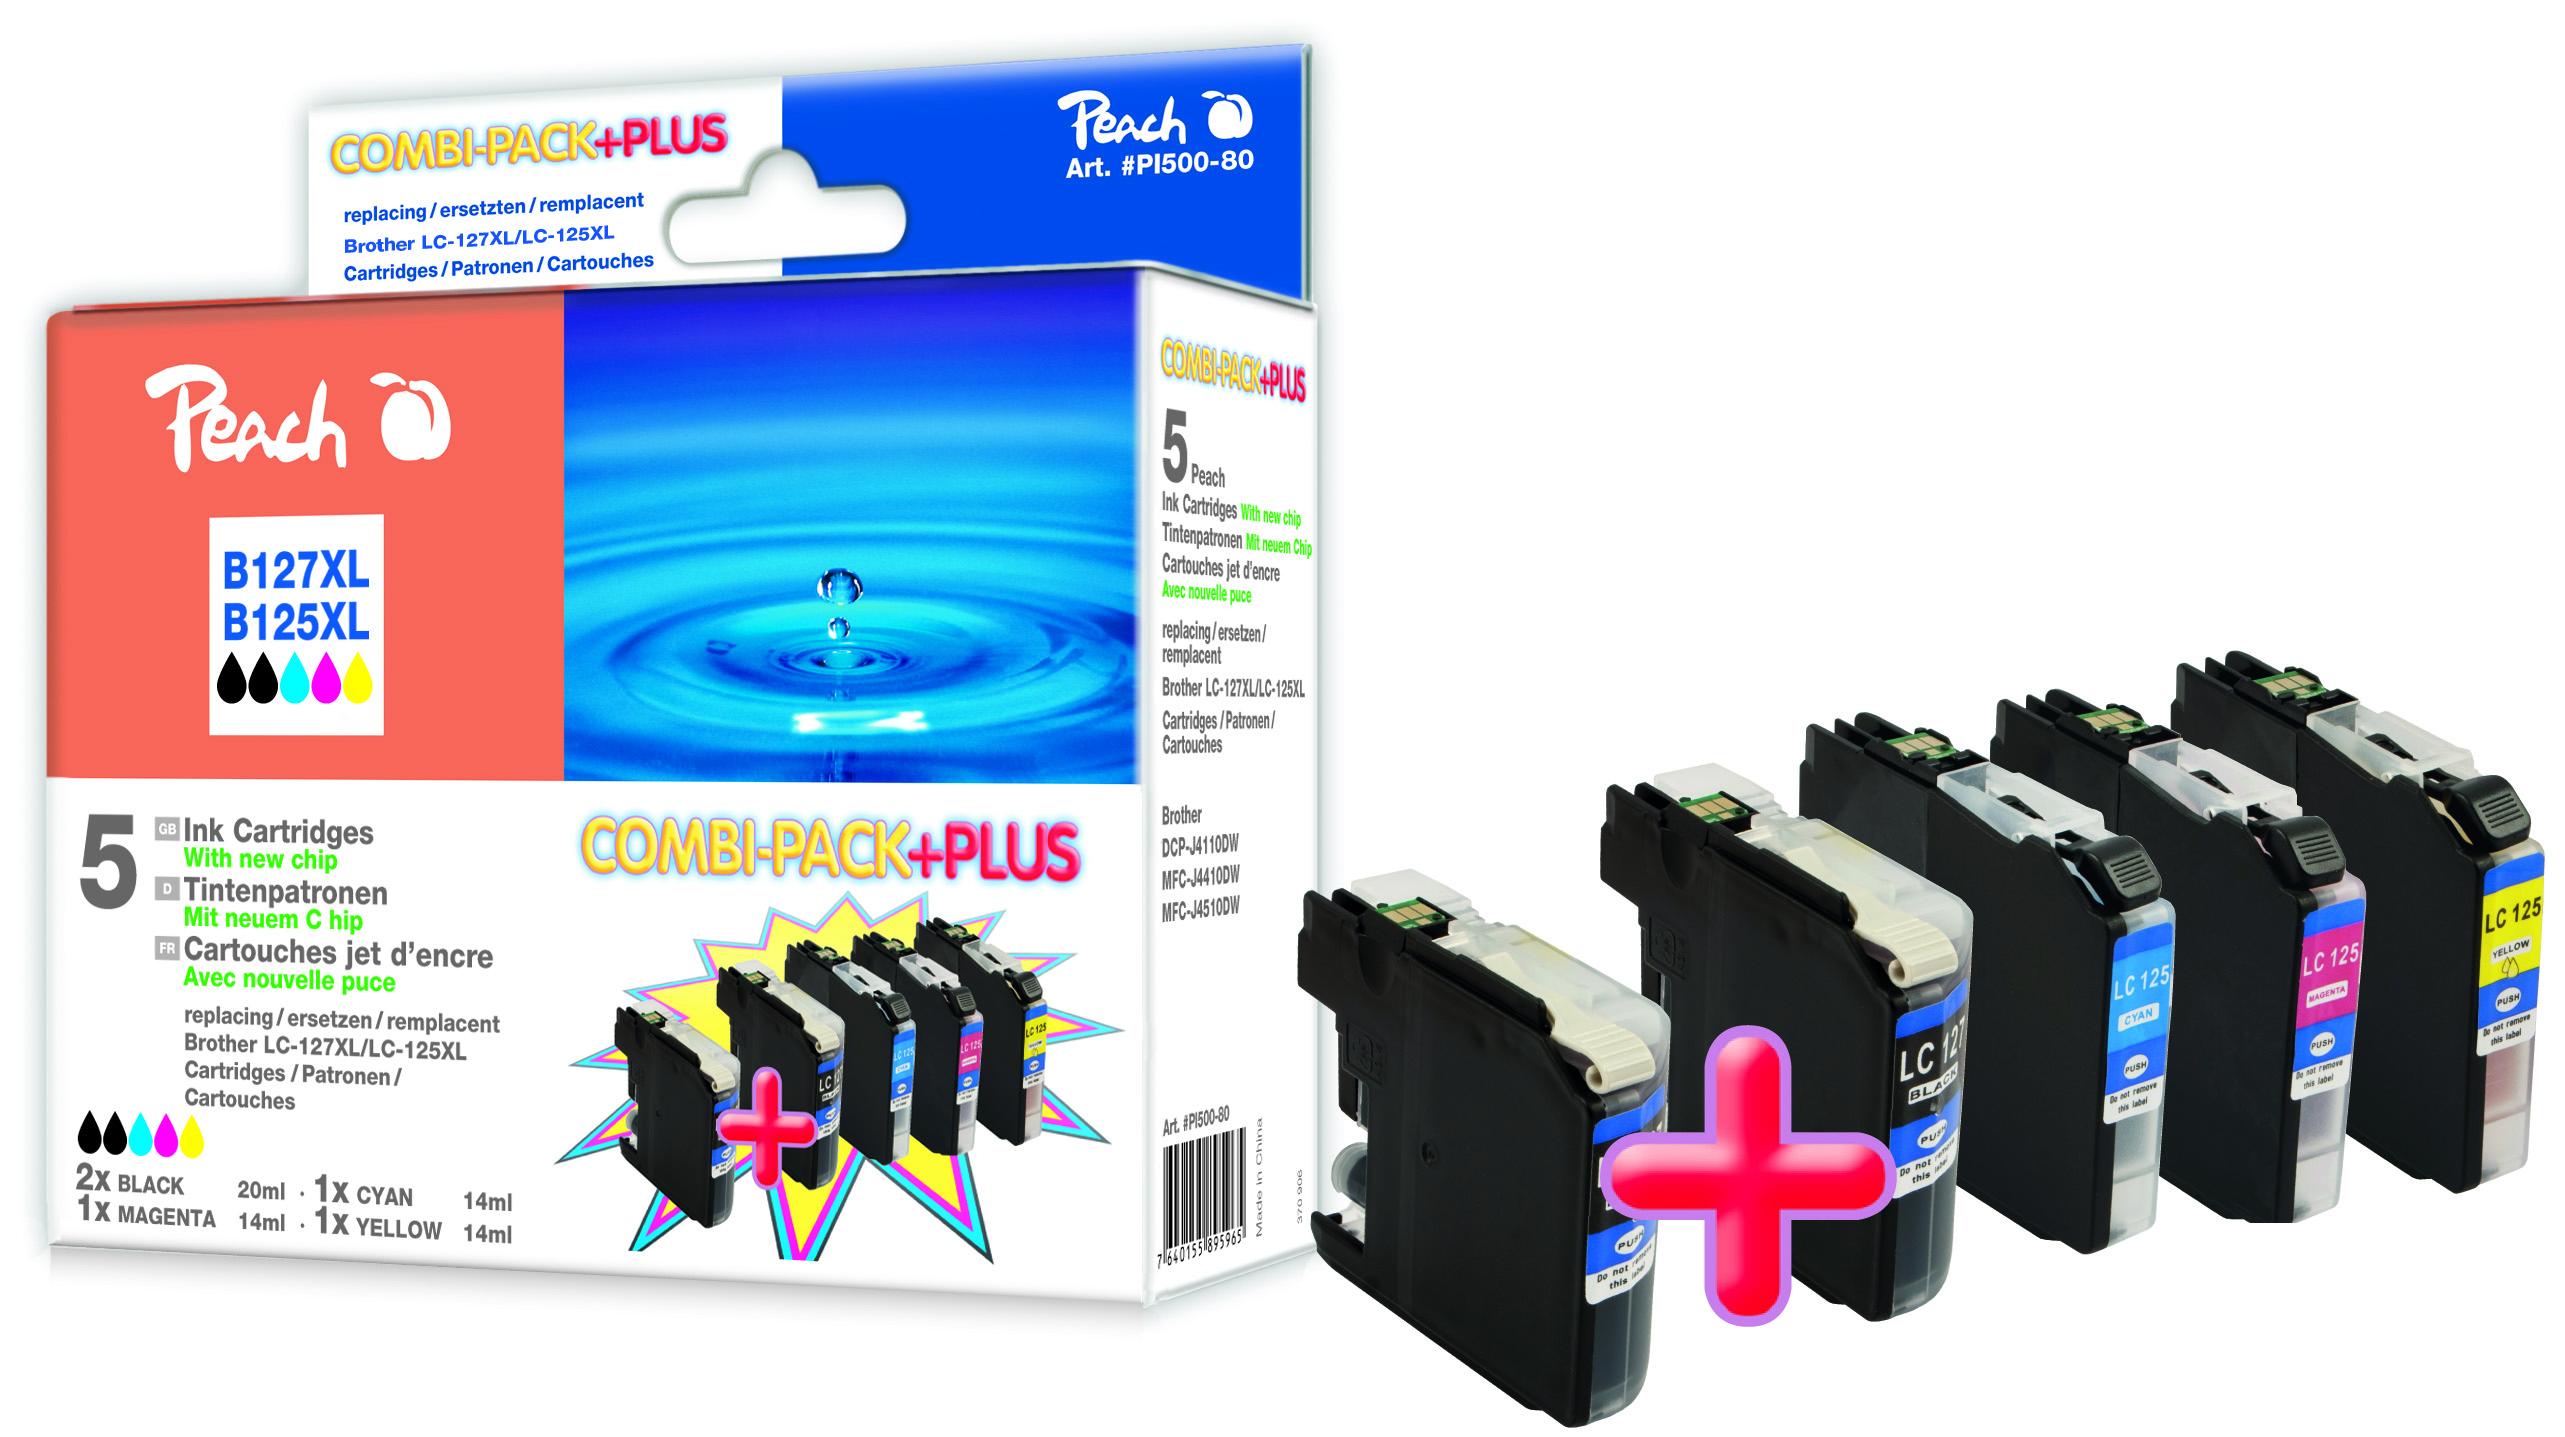 PI500-80 | Sada Peach Combi Plus, kompatibilní s Brother LC-125XL / LC-127XL